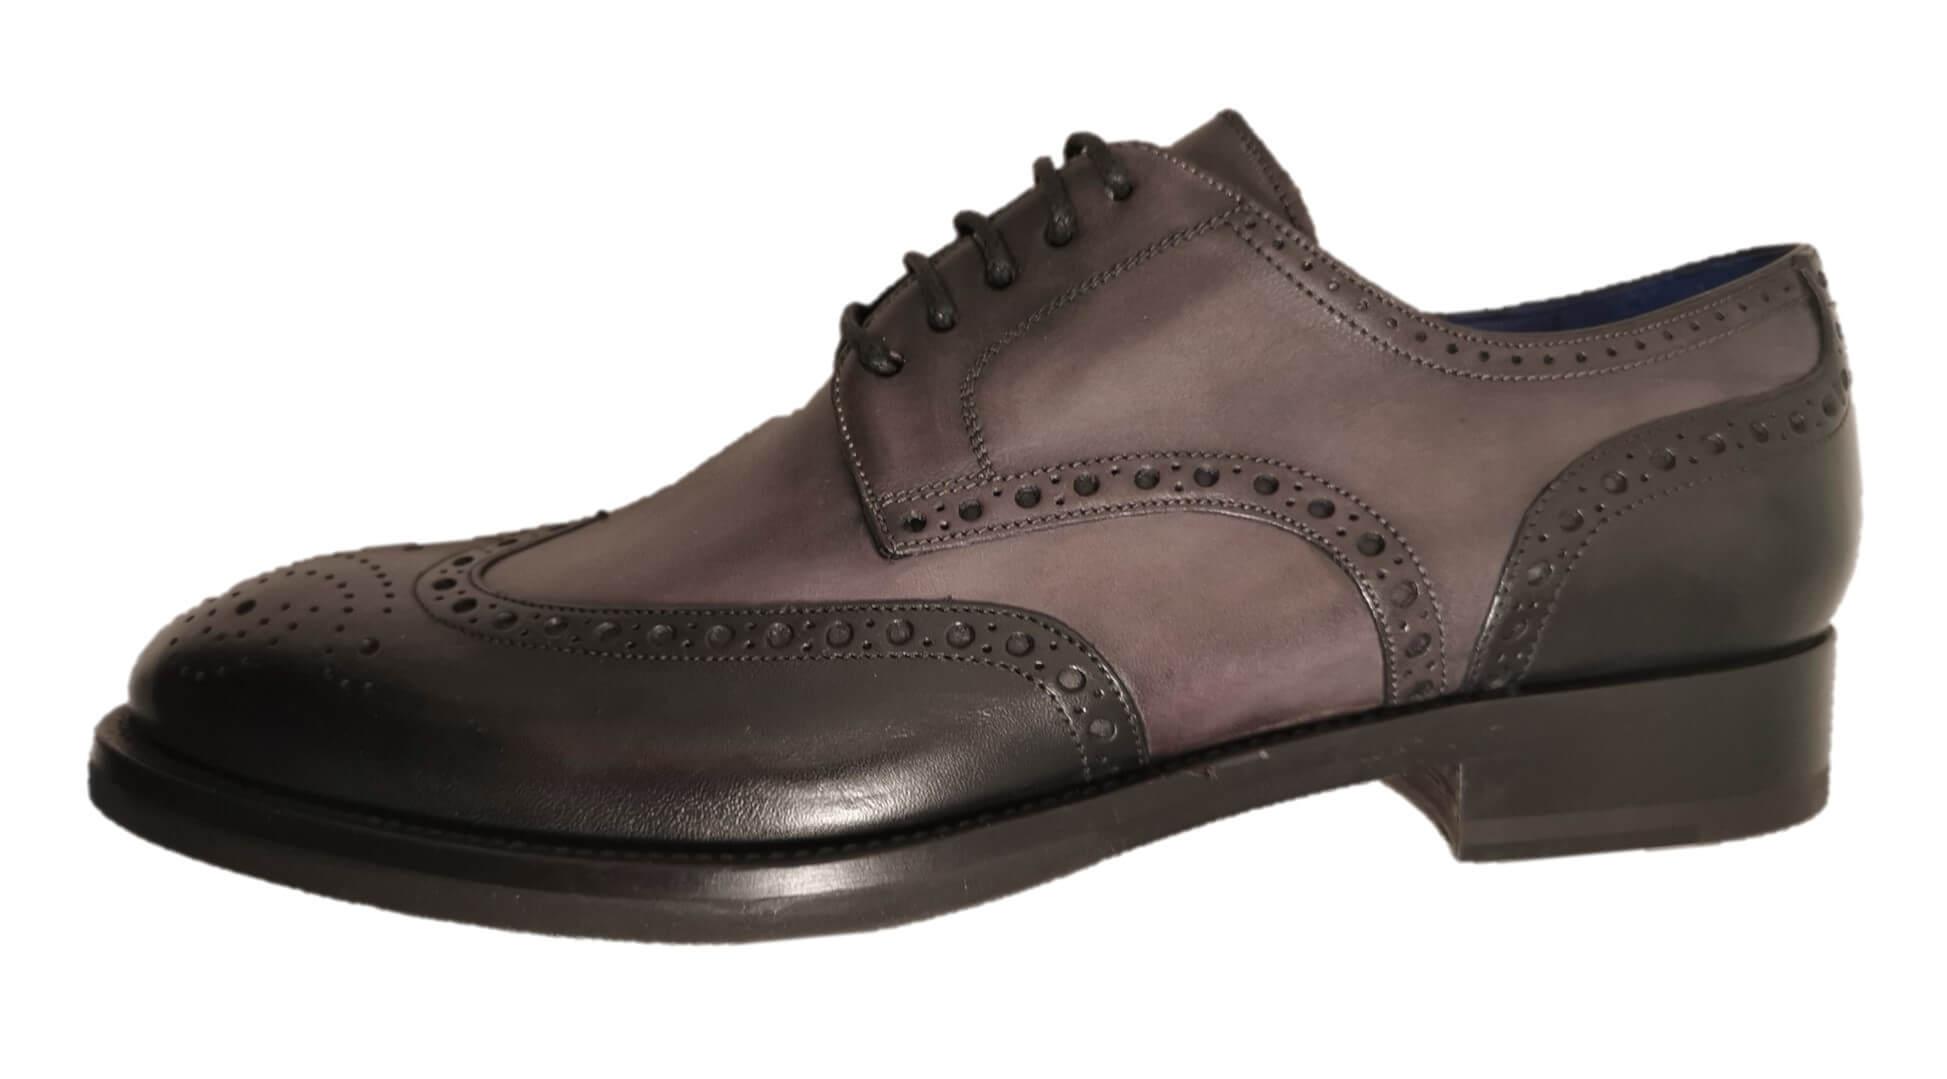 Black blake shoes